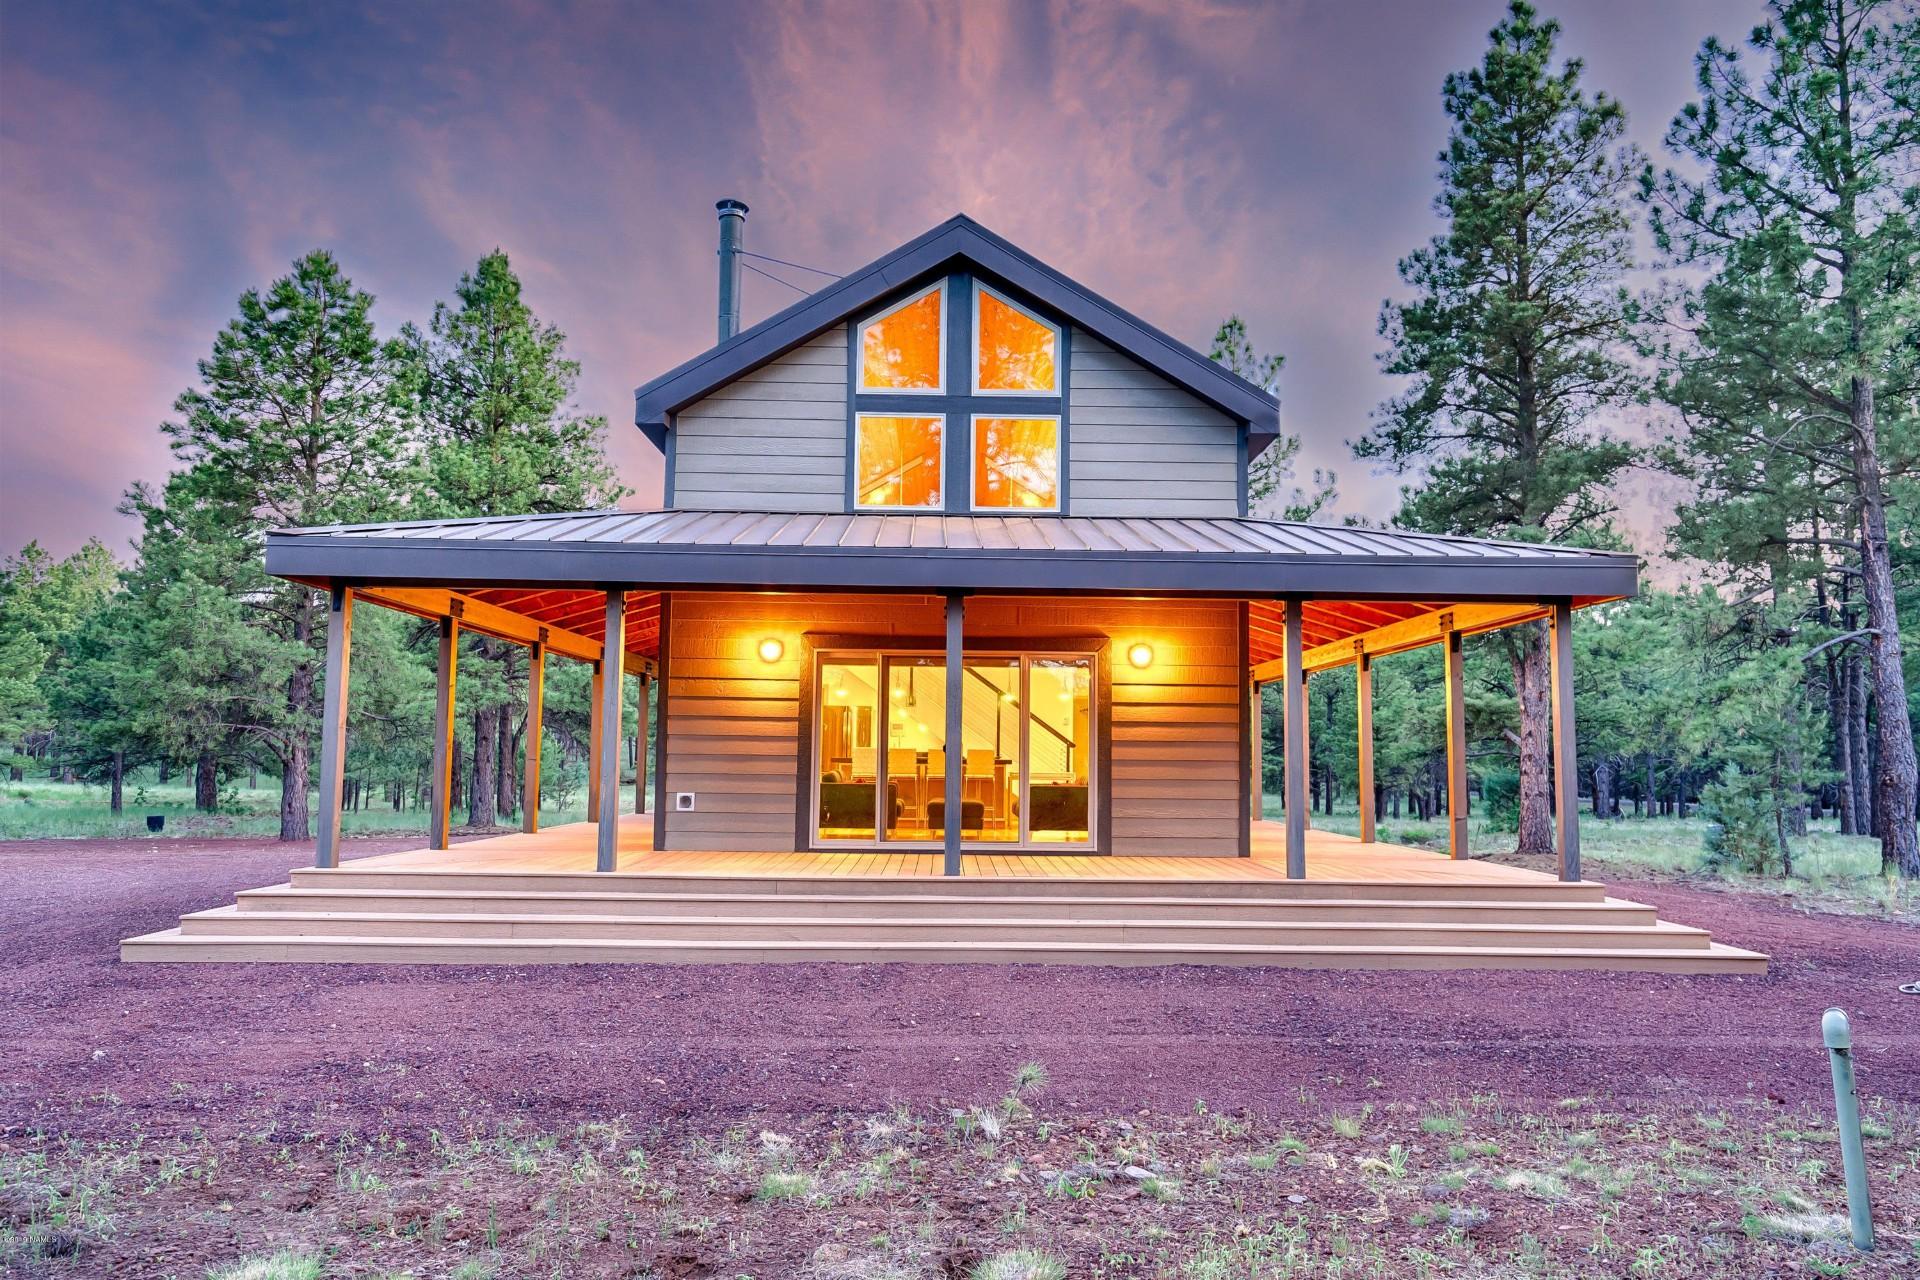 764 S Tall Timber Trail, Parks, AZ 86018